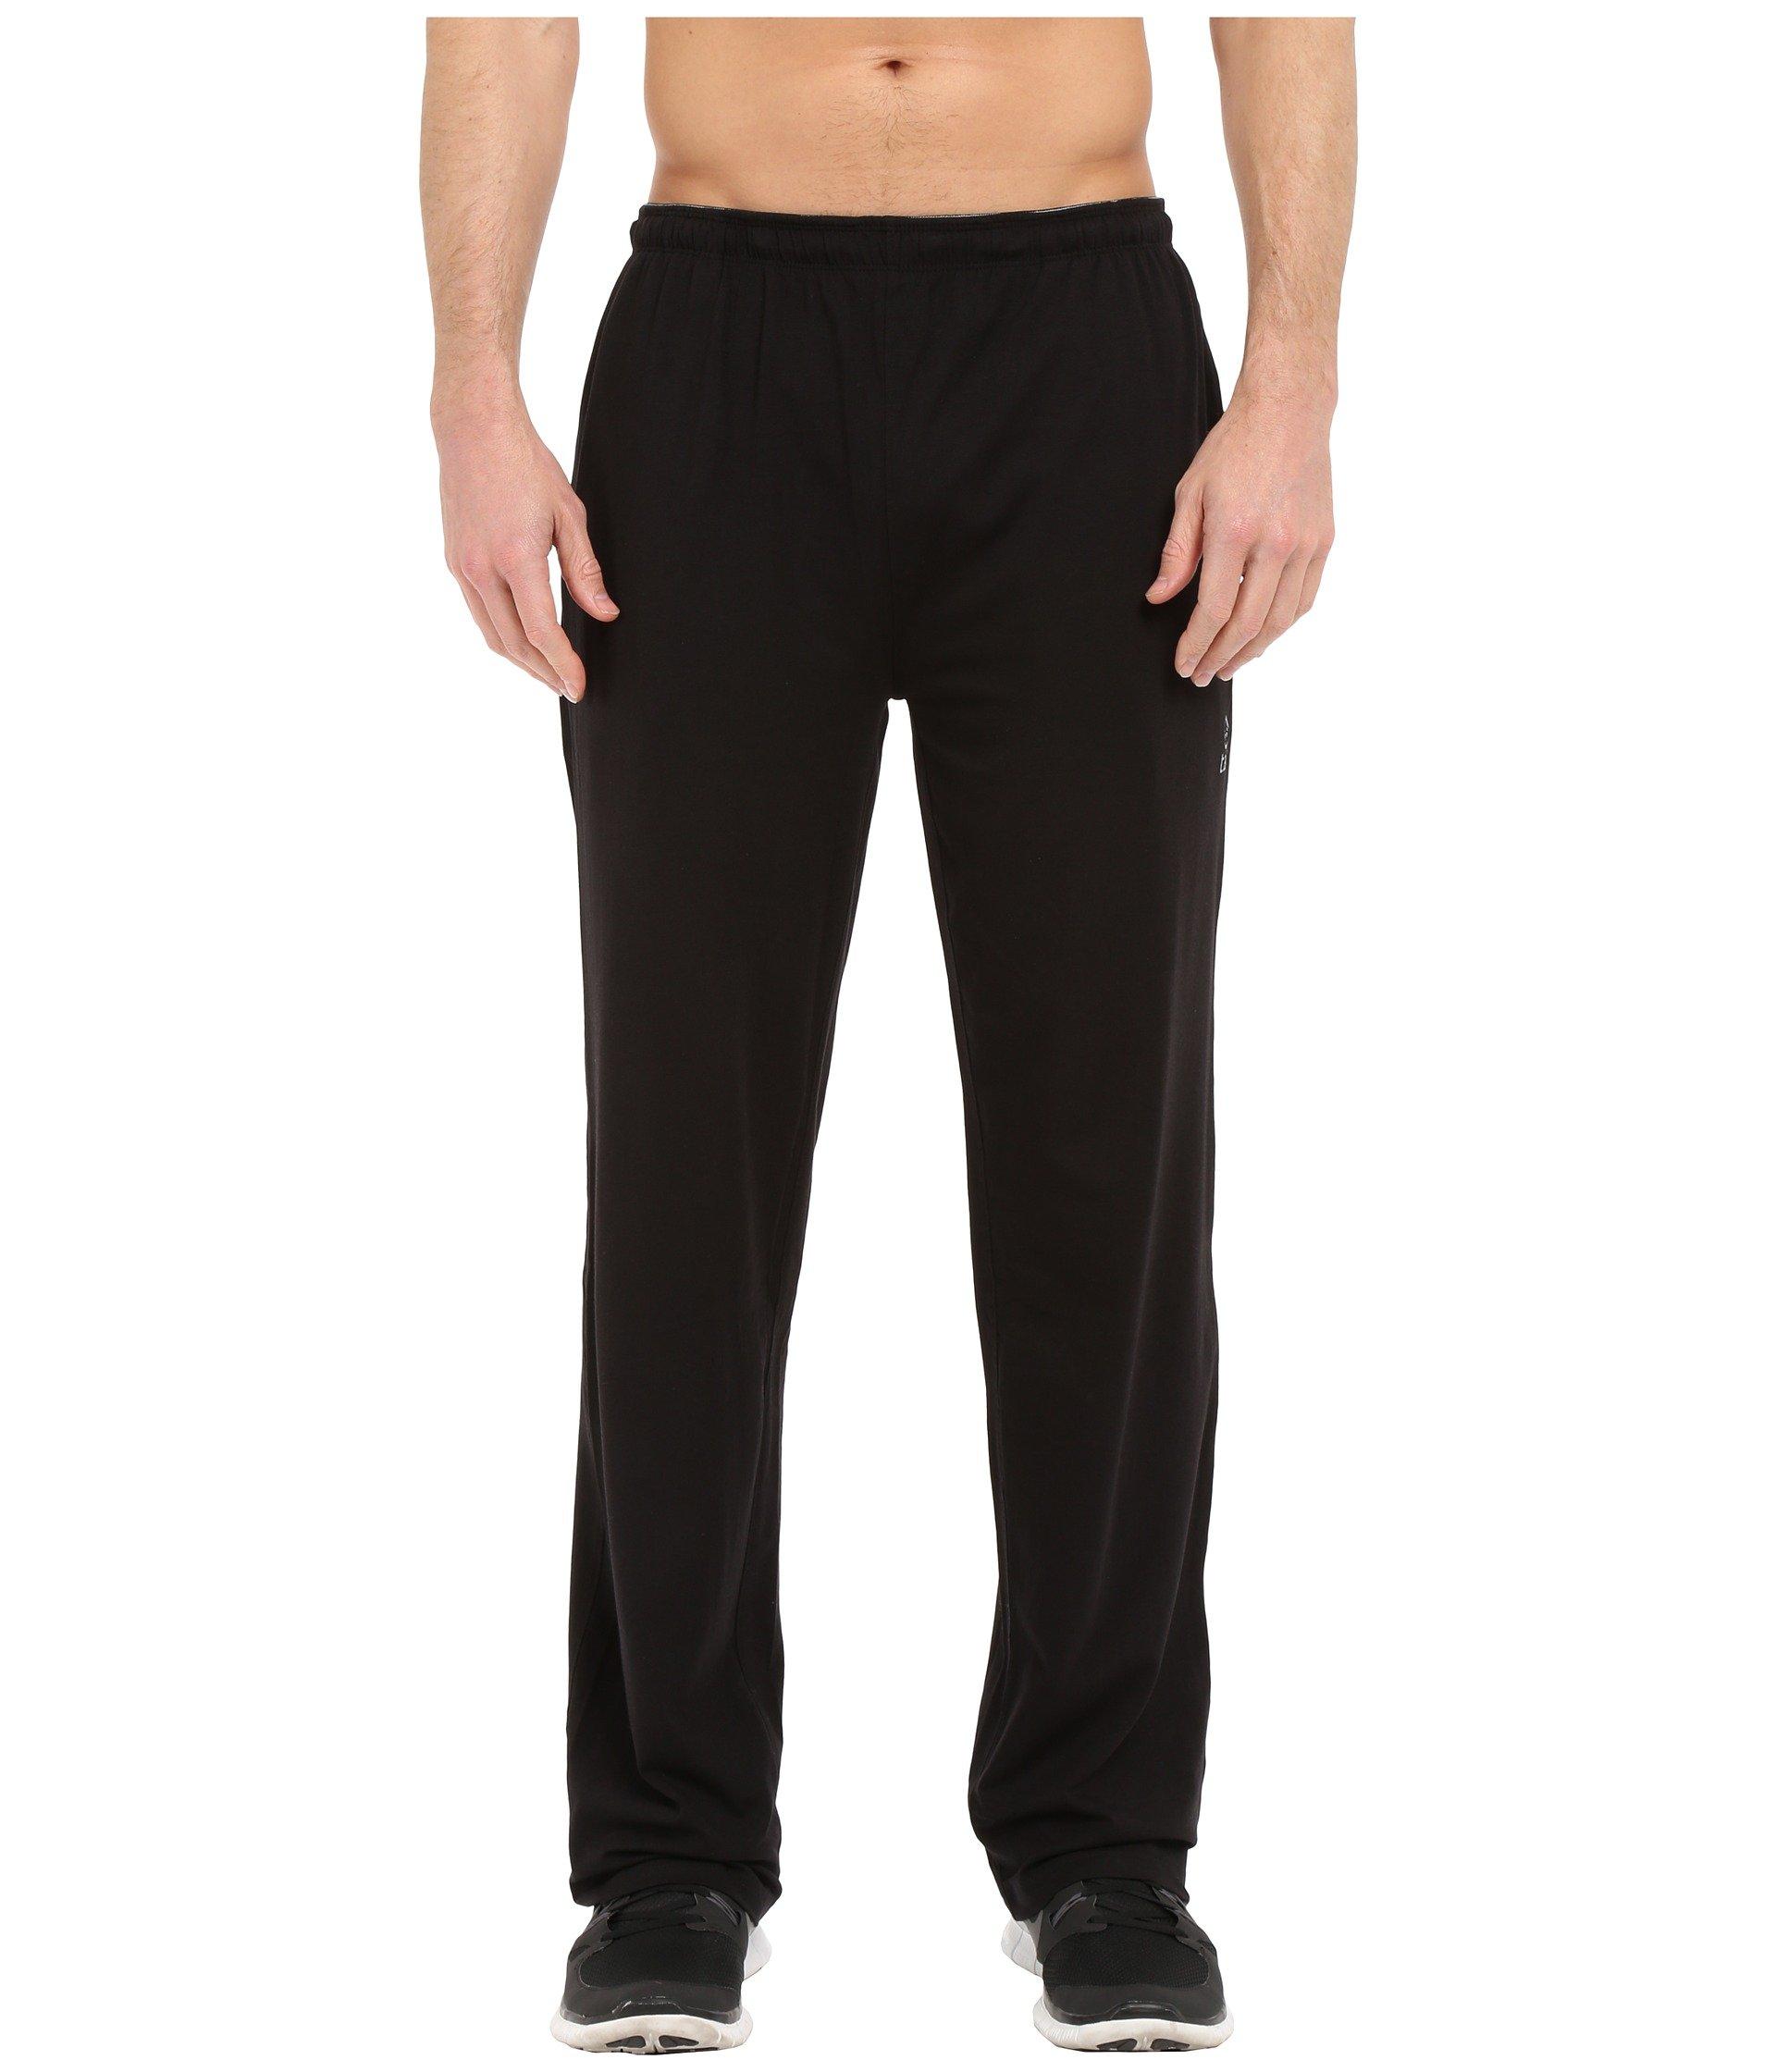 Training Black Tasc Pants Vital Performance 1IXwwvxqEF